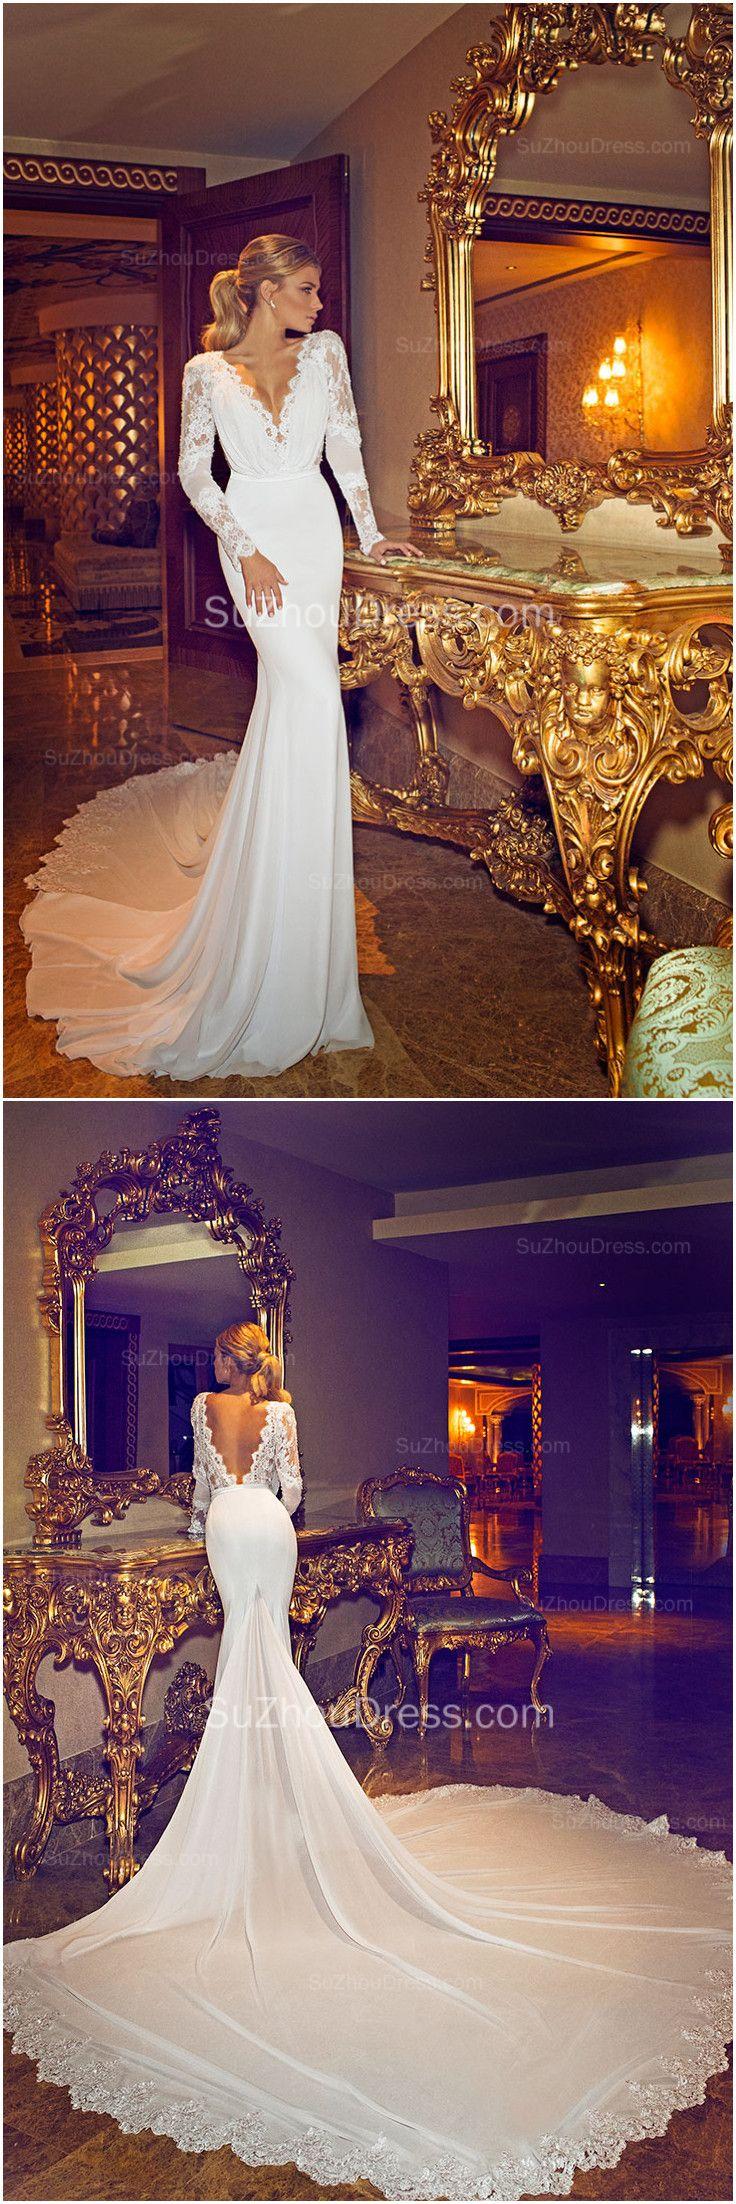 Chapel #Train V-Neck Mermaid #WeddingDress 2015 Long Sleeve Applique Open Back Bridal Gowns